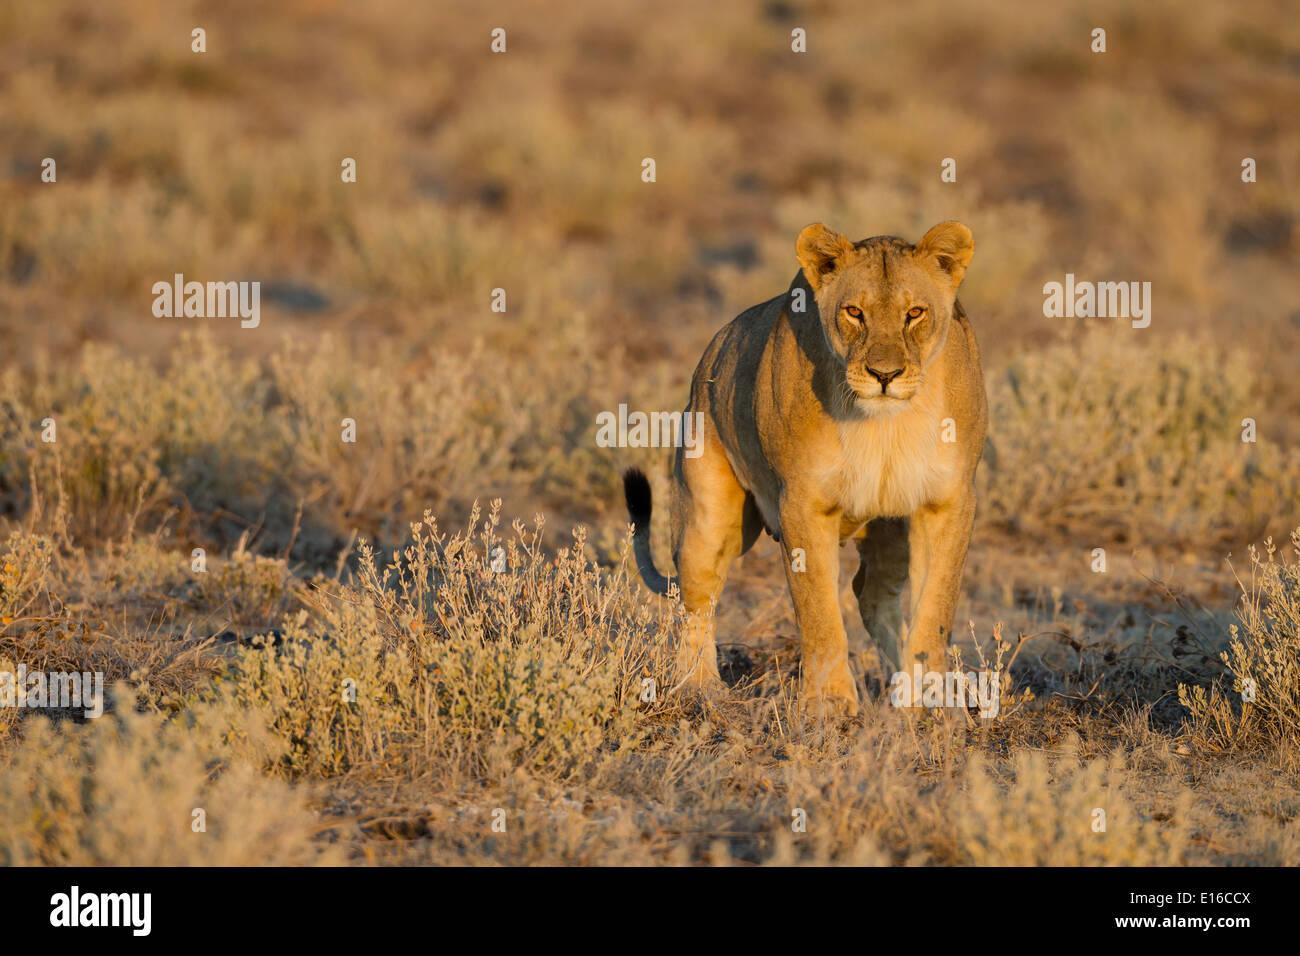 A female Lion - Stock Image